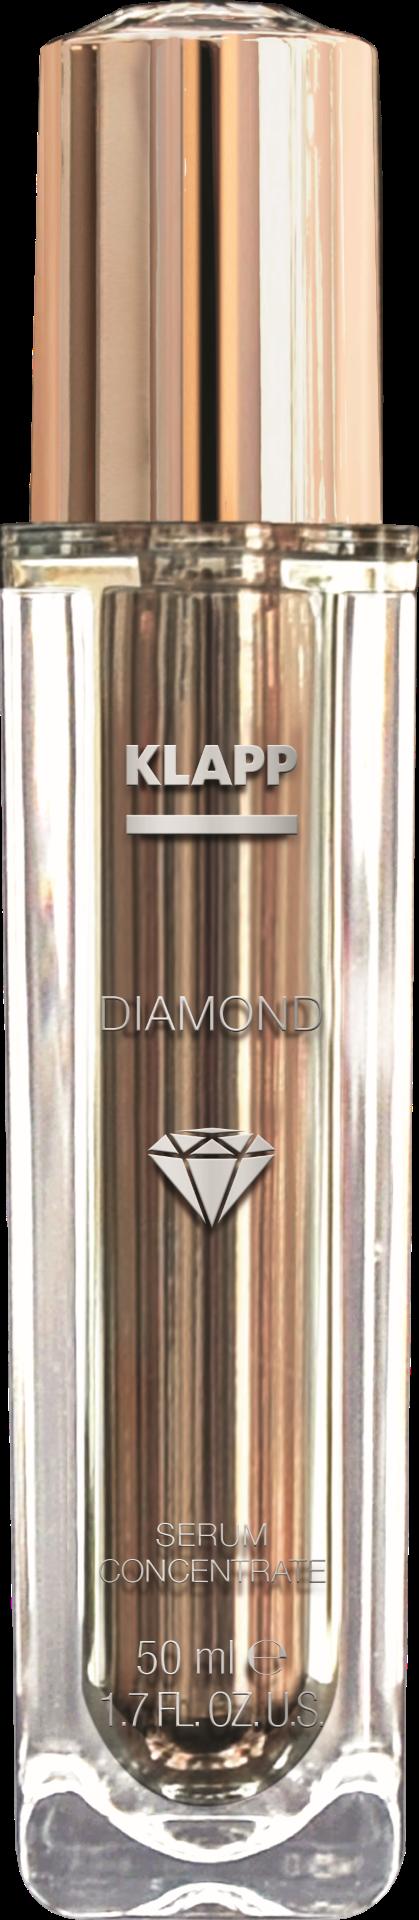 DIAMOND SERUM CONCENTRATE